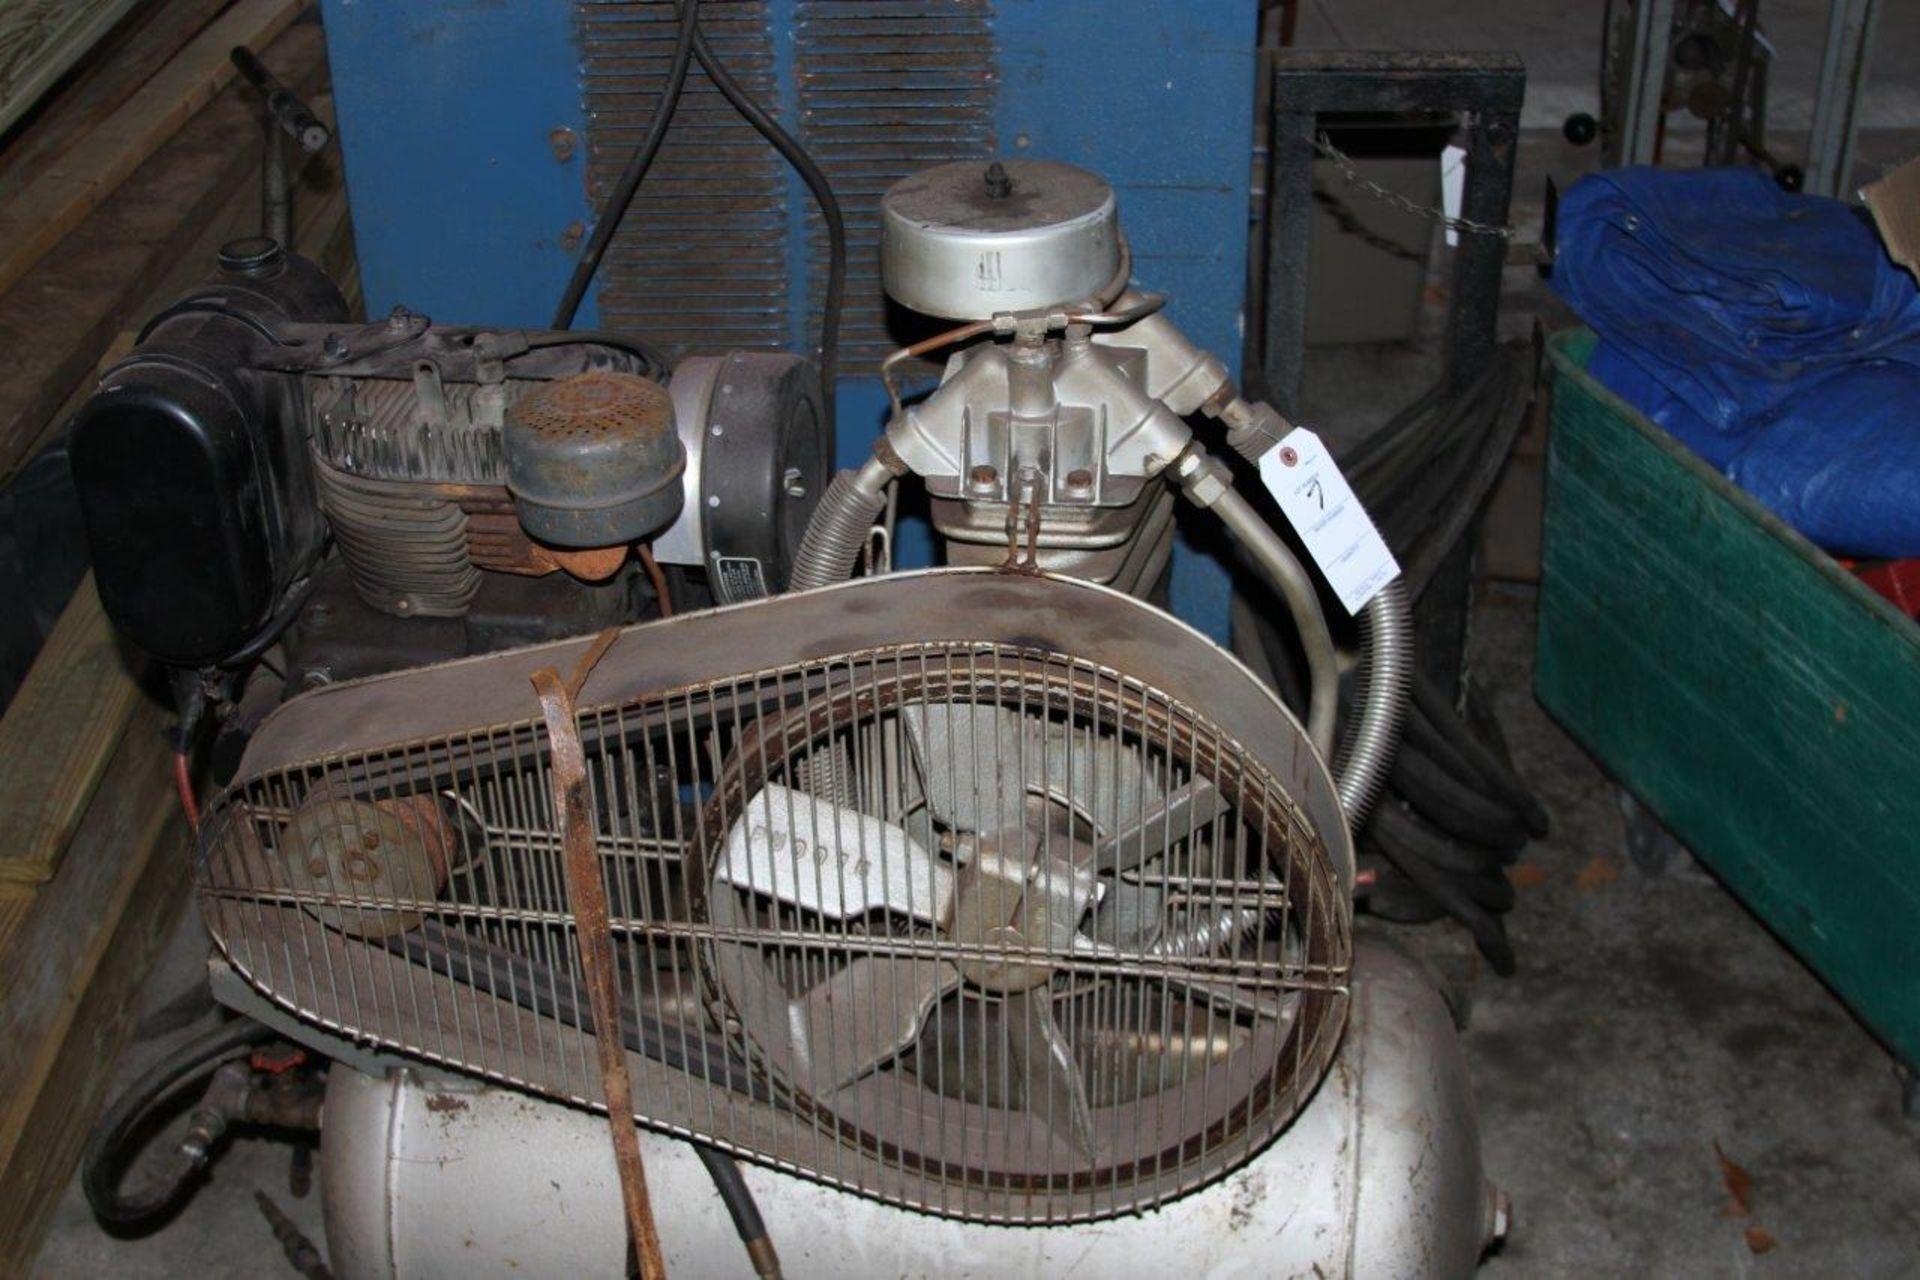 Lot 7 - Campbell Hausfeld Kohler Gas Powered Air Compressor